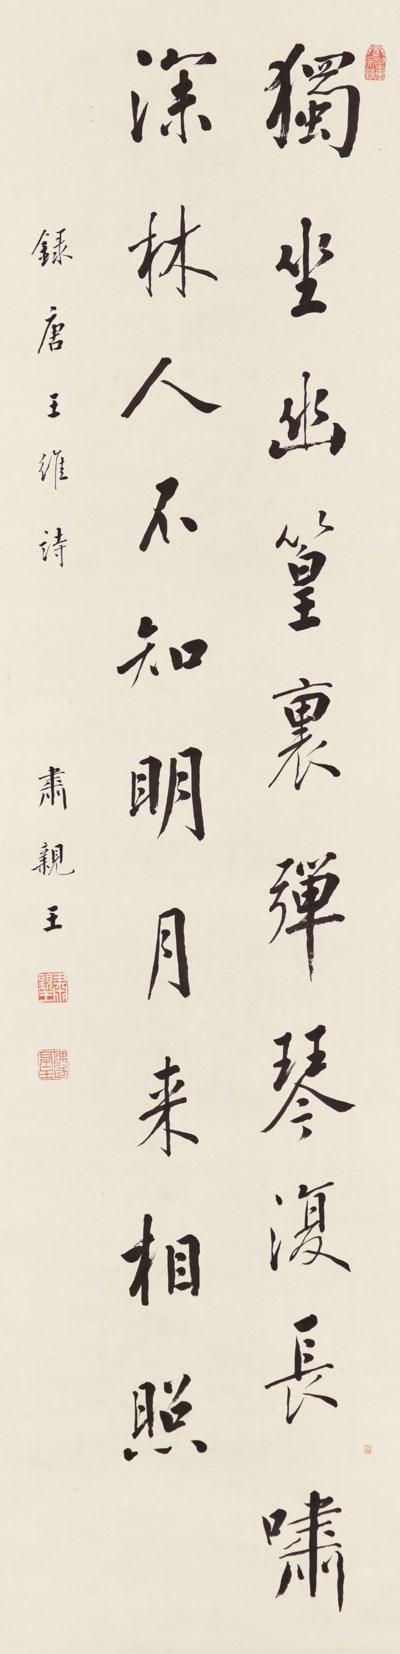 Shan qi (PRINCE SU, 1866-1922)